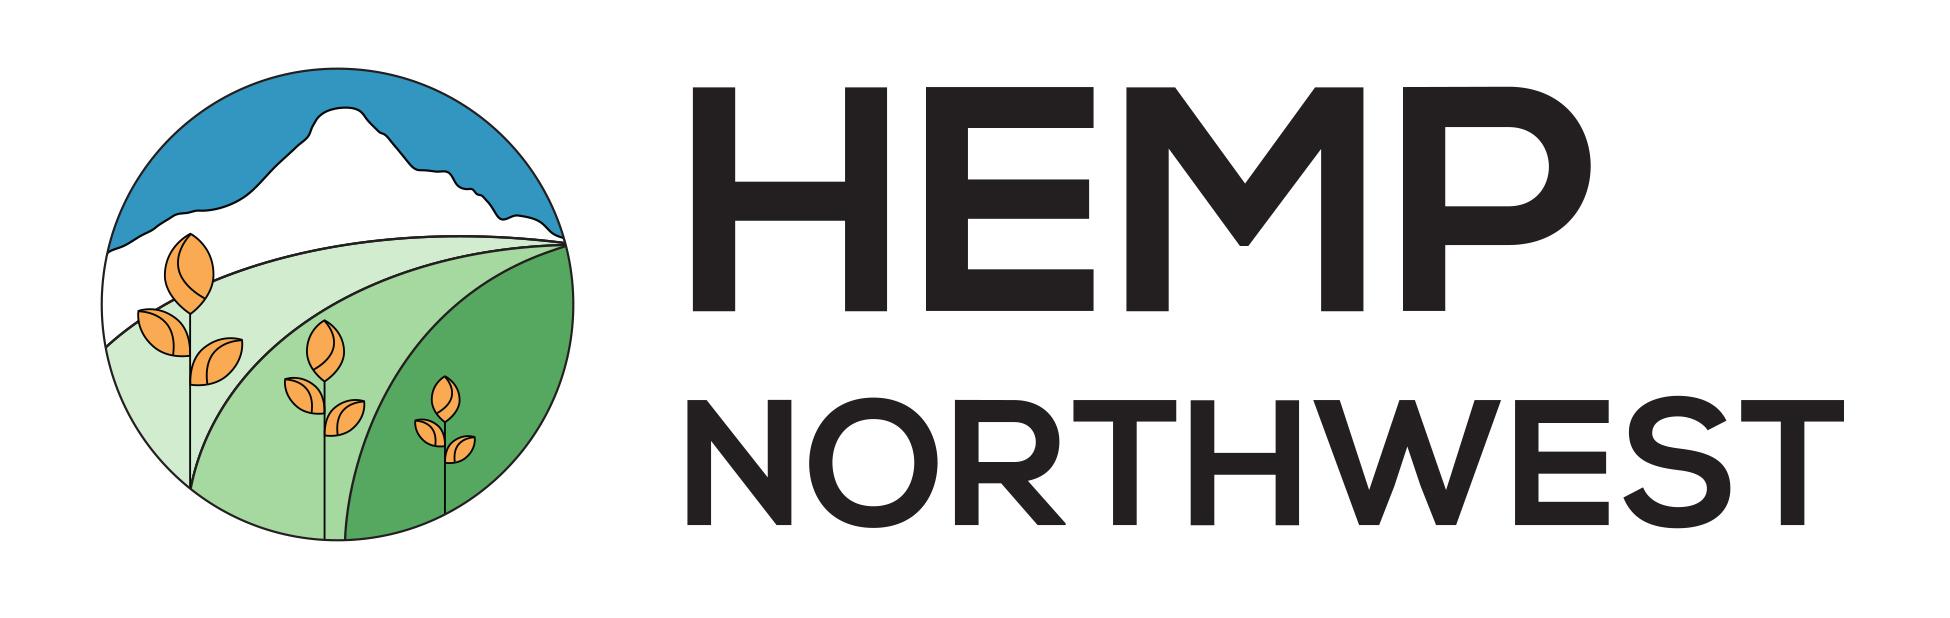 HempNorthwest Logo.jpg